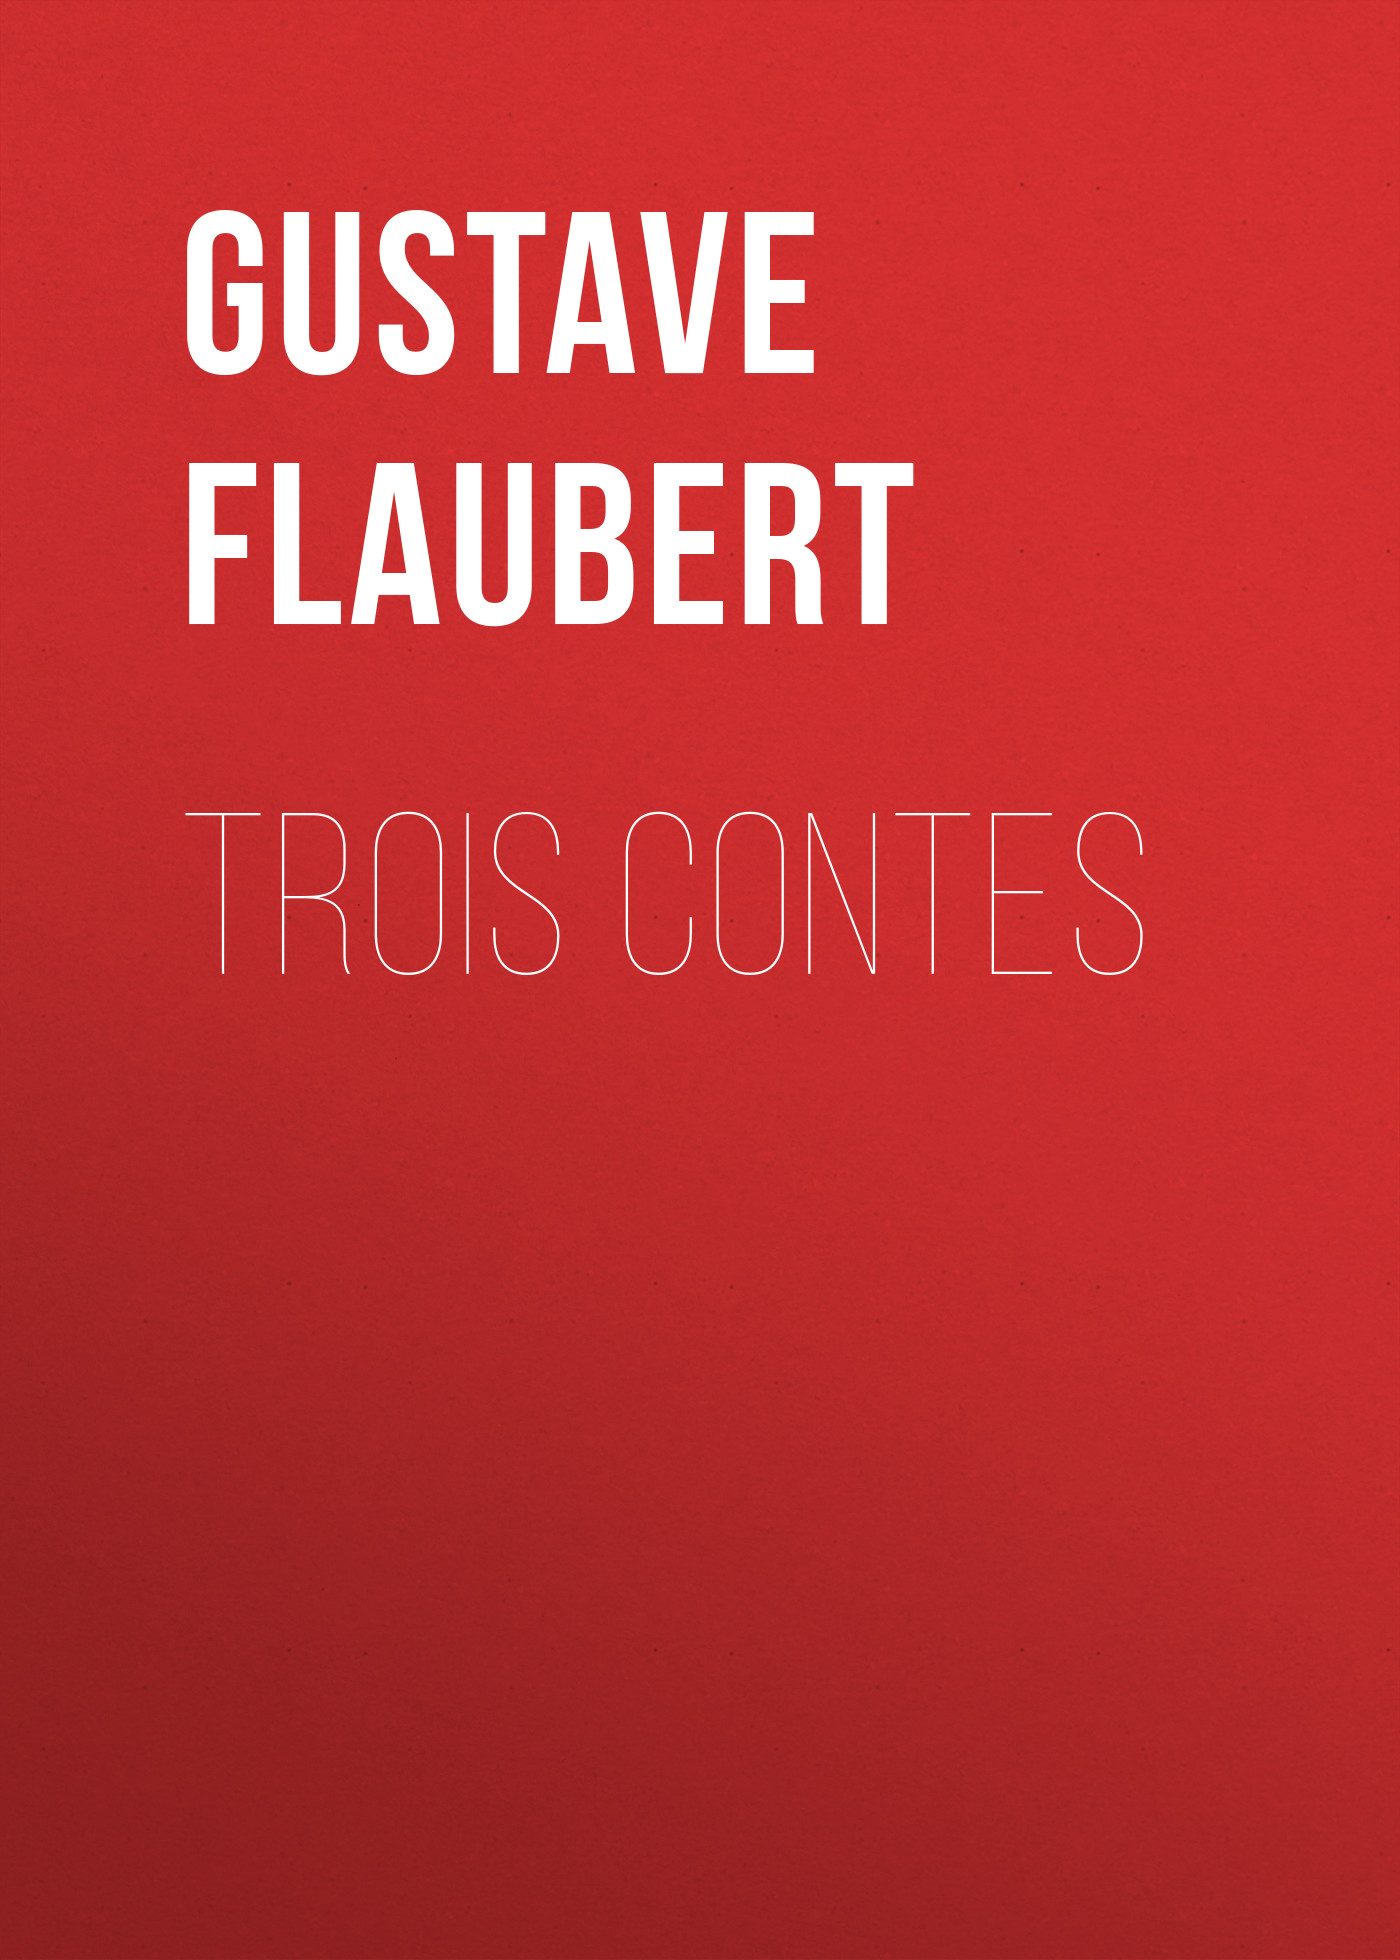 Gustave Flaubert Trois contes